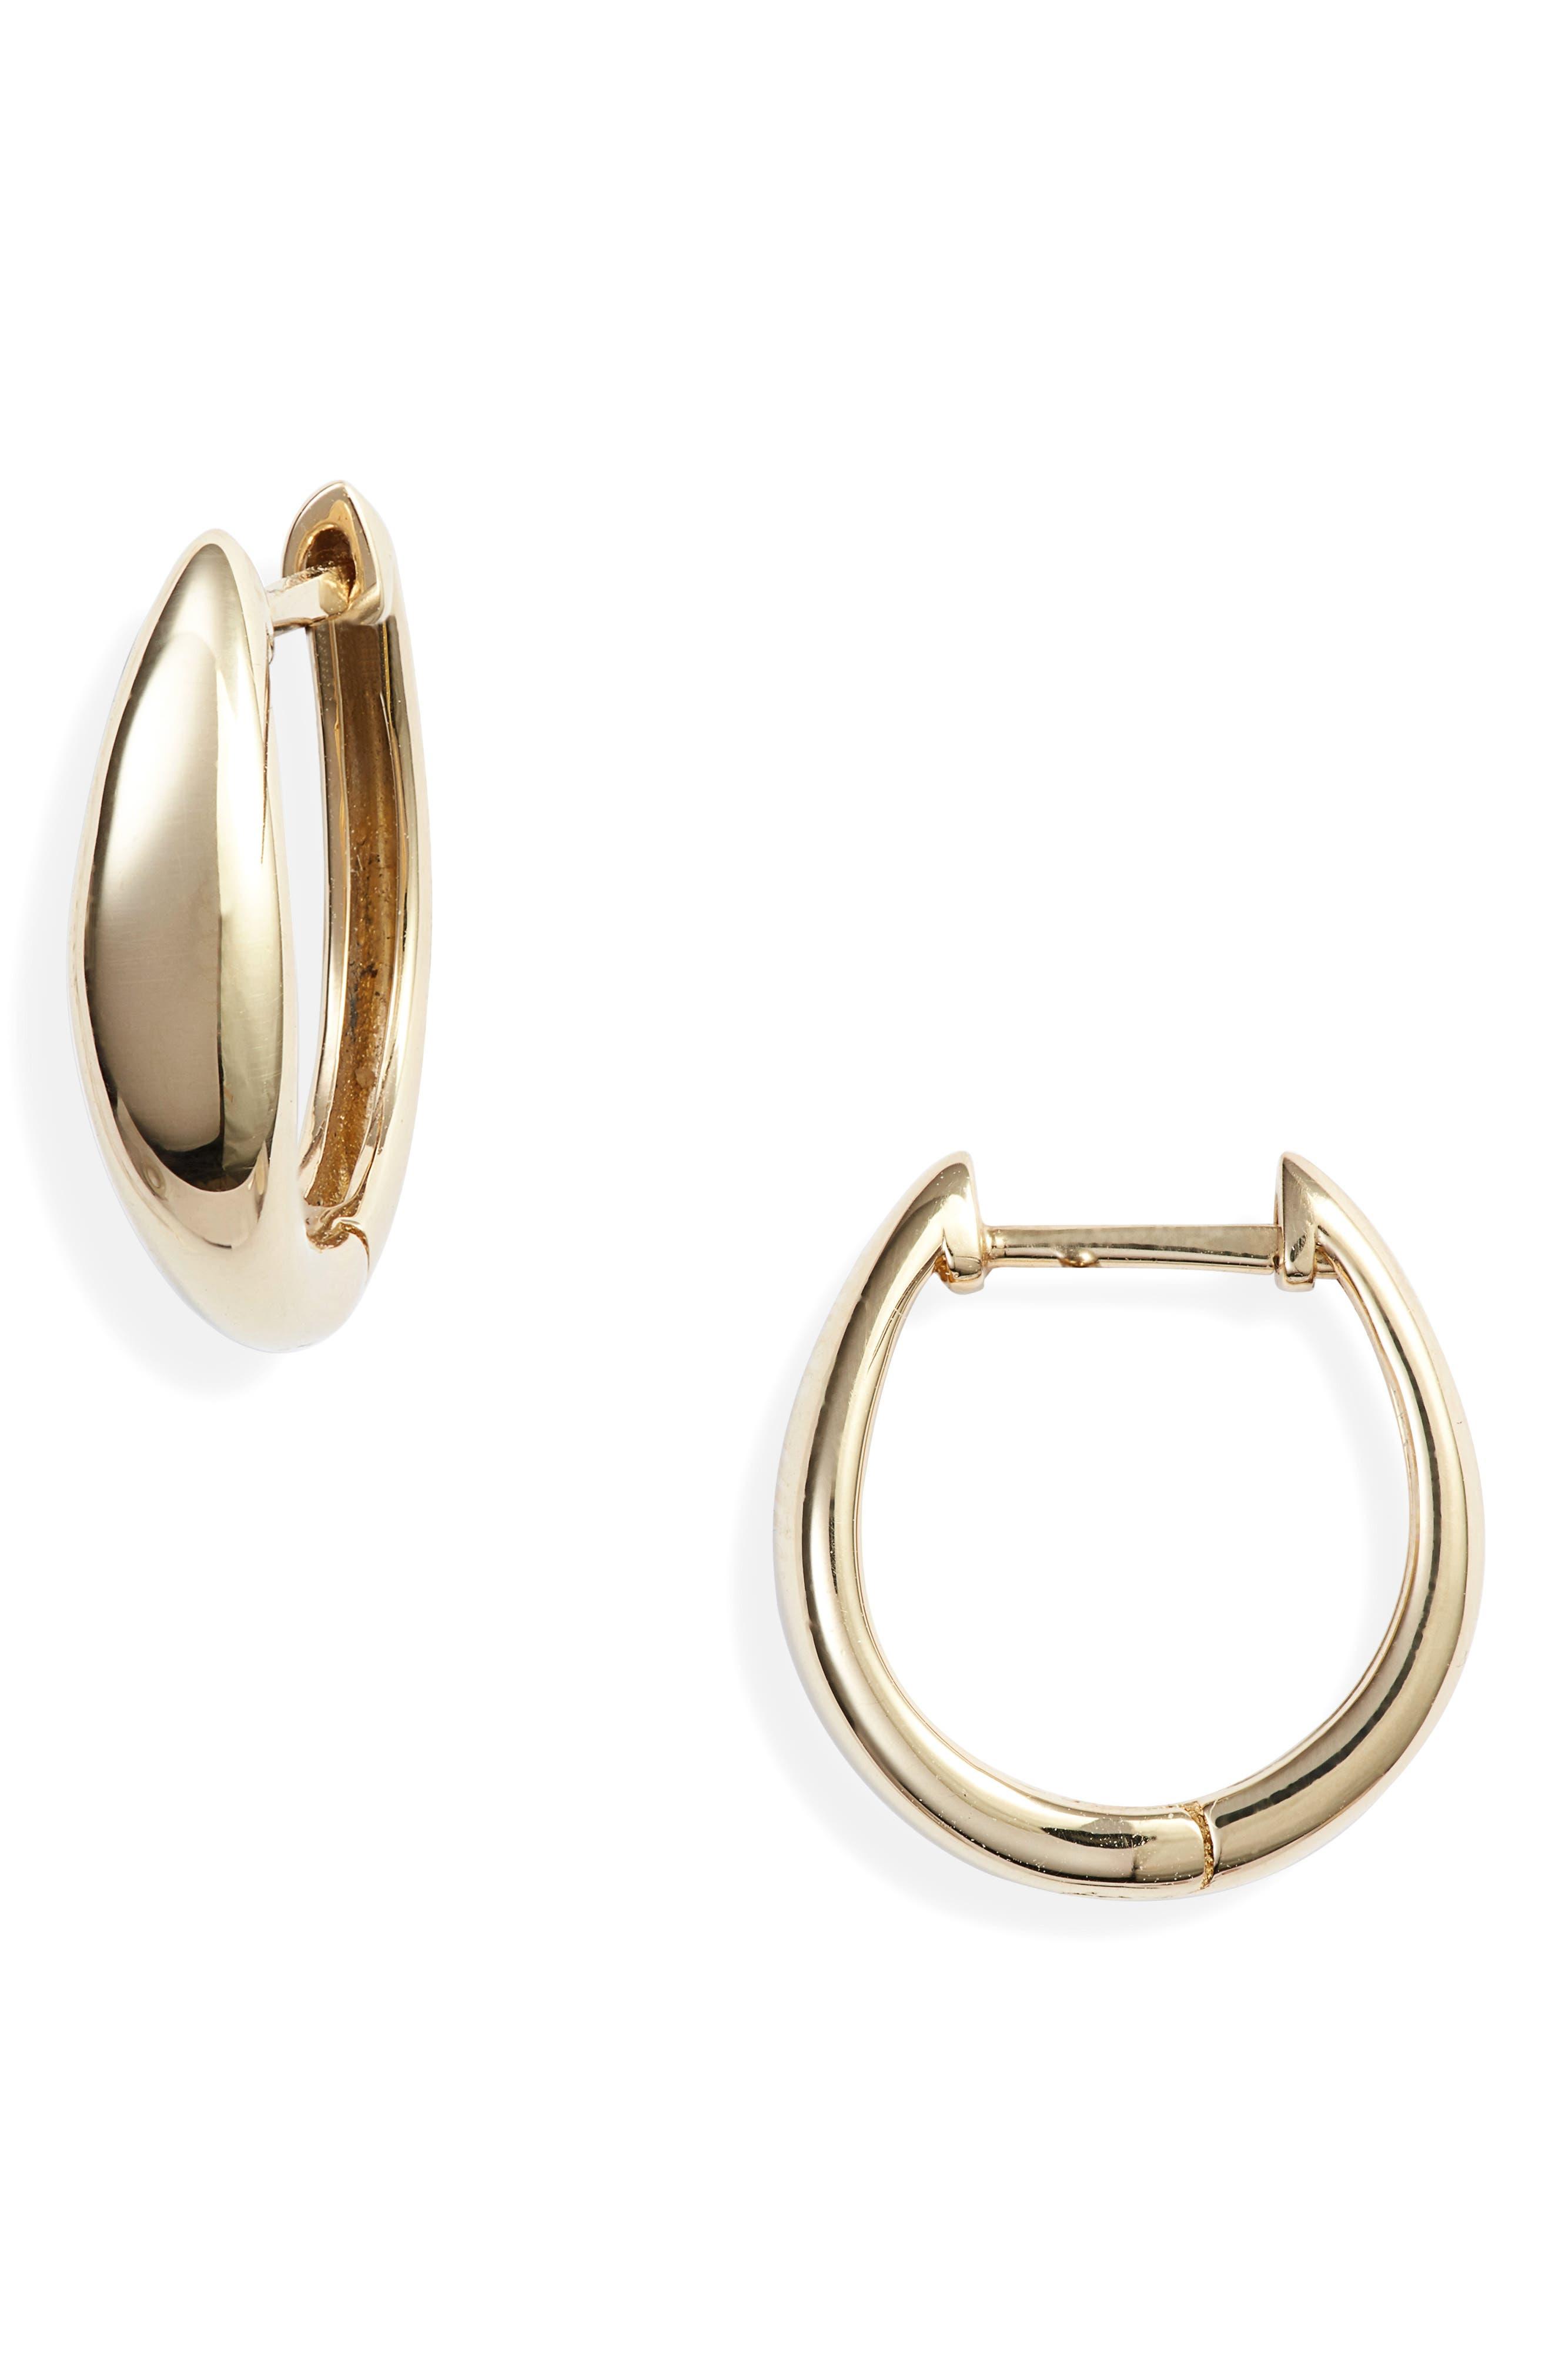 BONY LEVY,                             14K Gold Hoop Earrings,                             Main thumbnail 1, color,                             YELLOW GOLD/ DIA